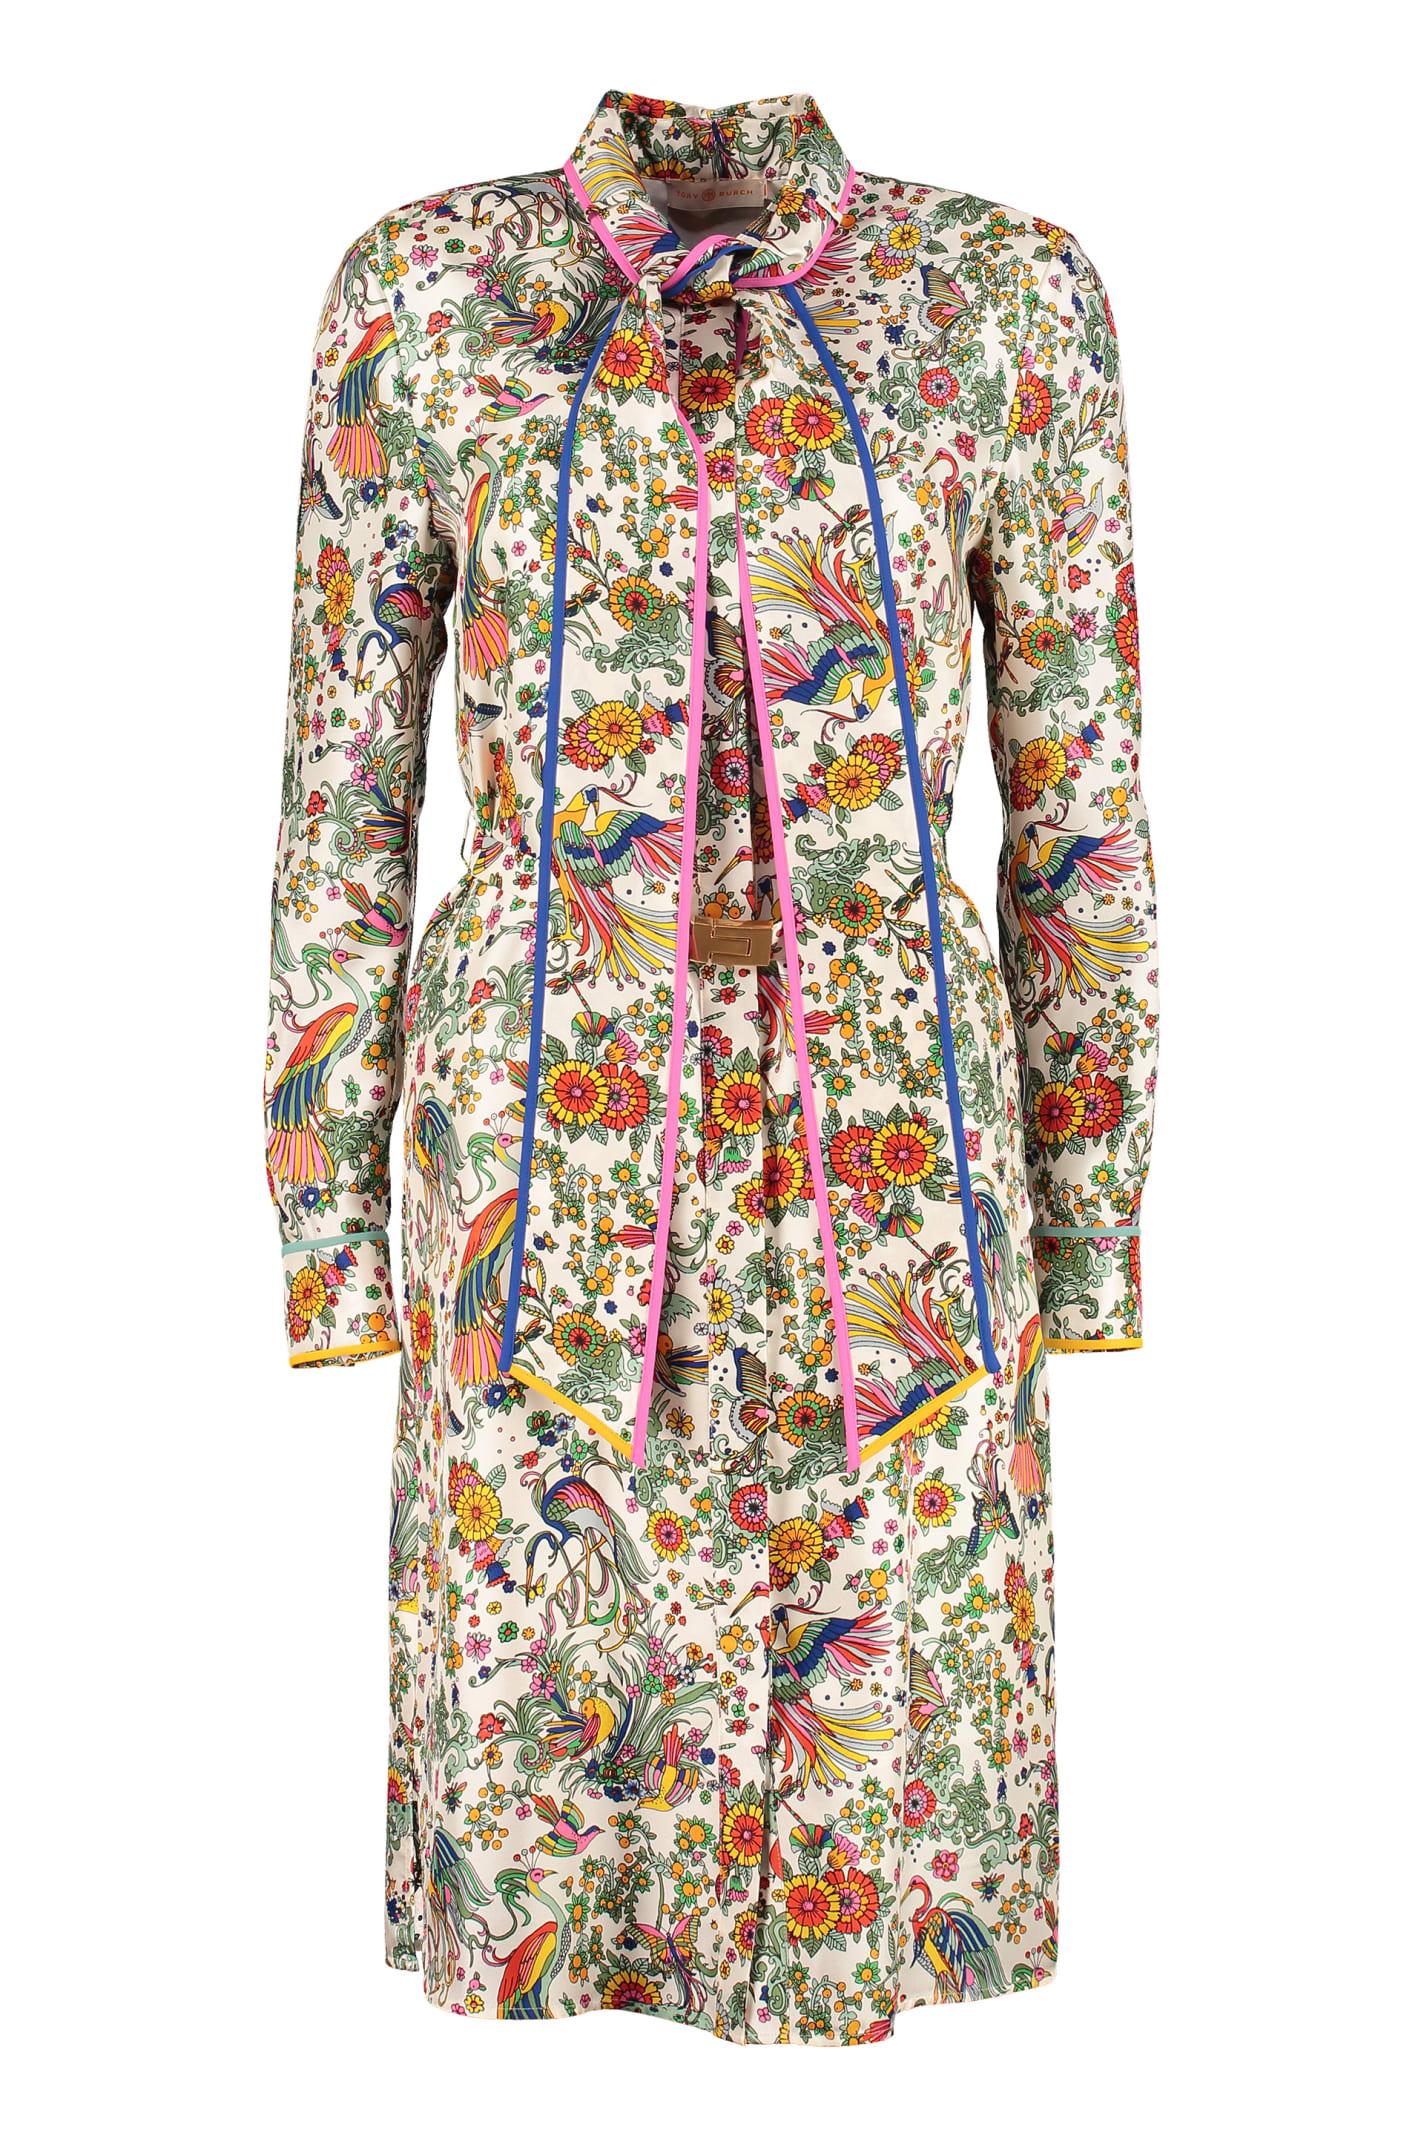 Buy Tory Burch Printed Shirtdress online, shop Tory Burch with free shipping